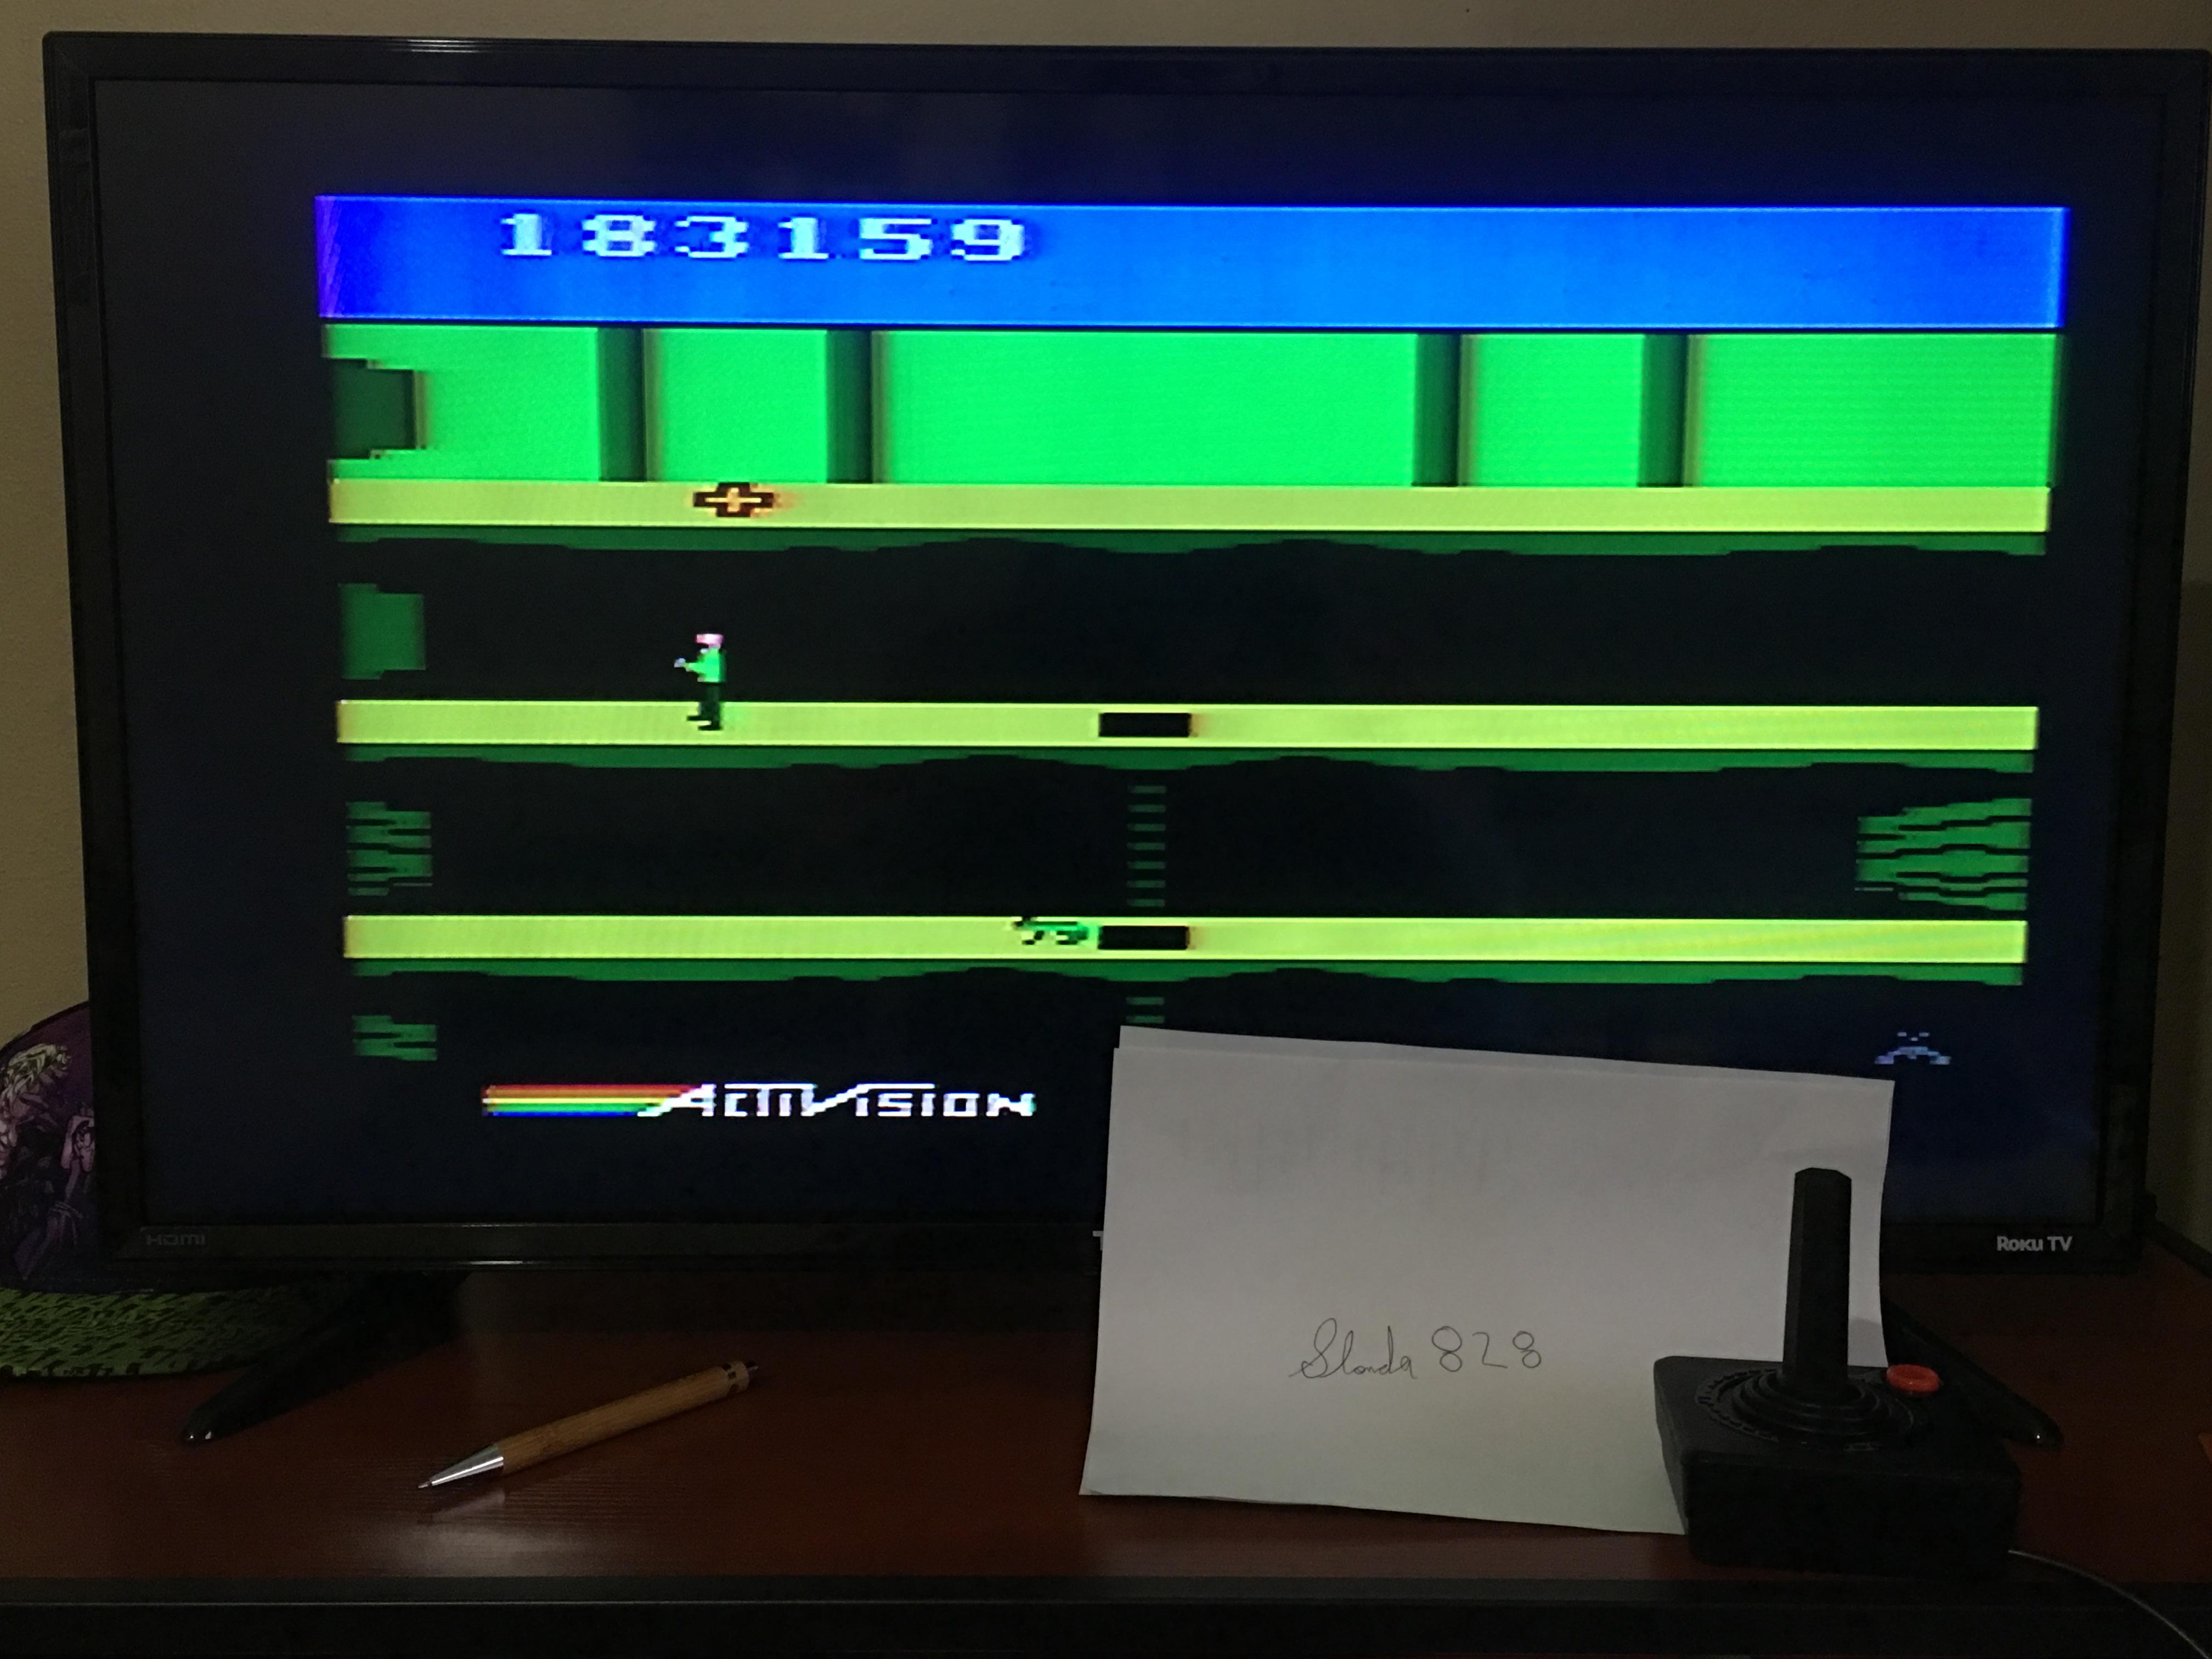 slonda828: Pitfall II: Lost Caverns (Atari 2600) 183,159 points on 2017-09-01 12:58:21